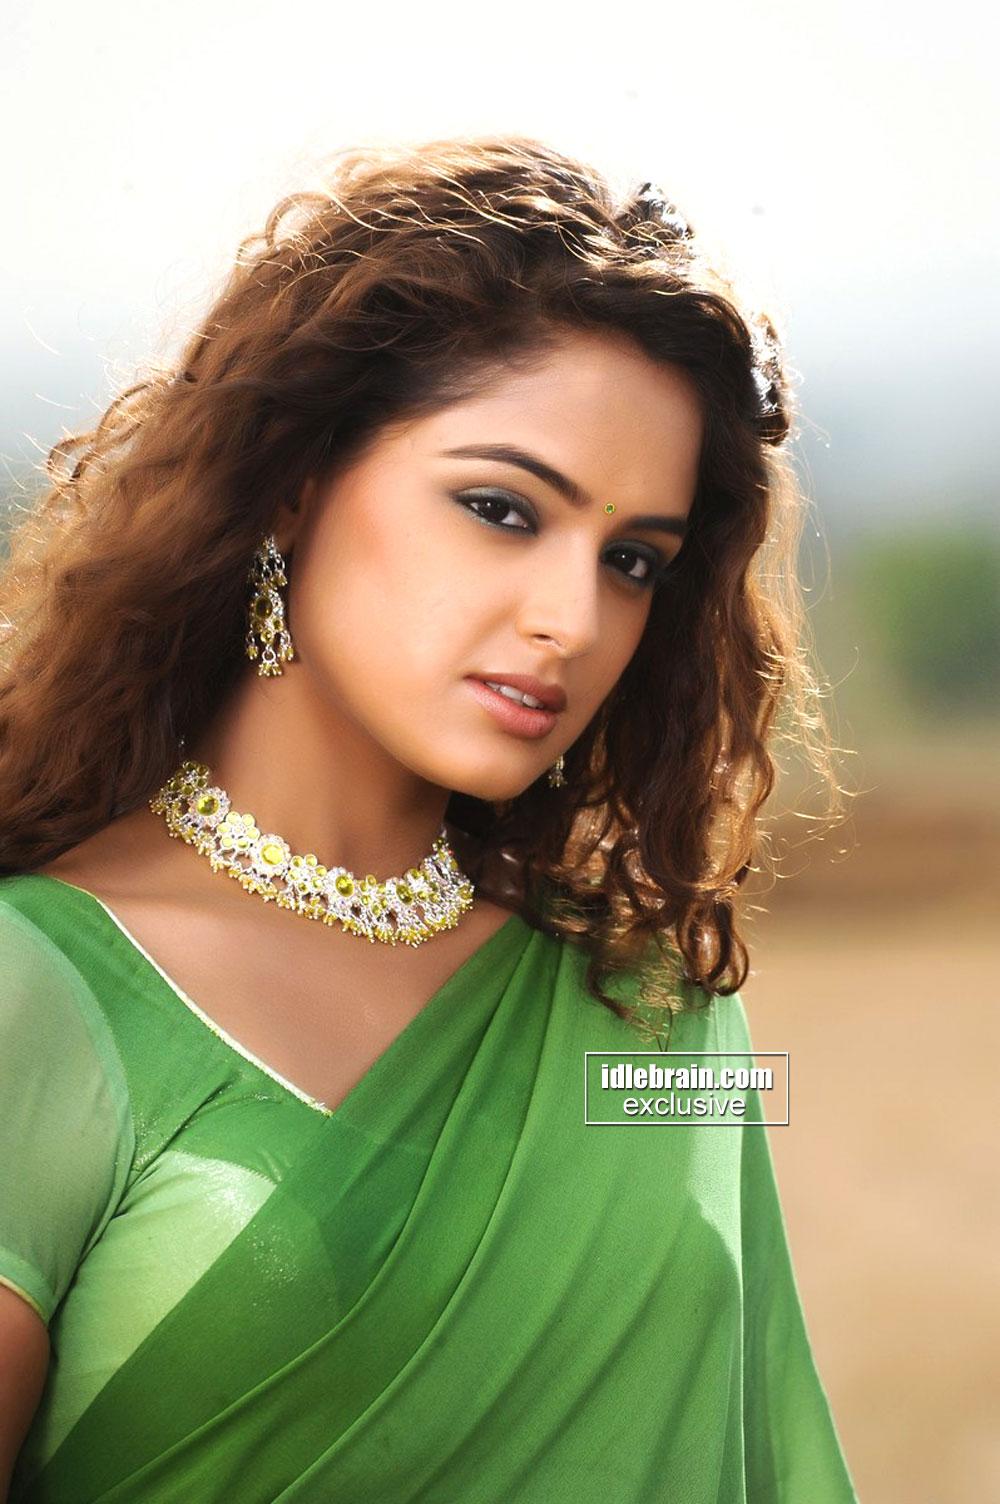 Endless wallpaper indian beautiful girl - Indian ladies wallpaper ...